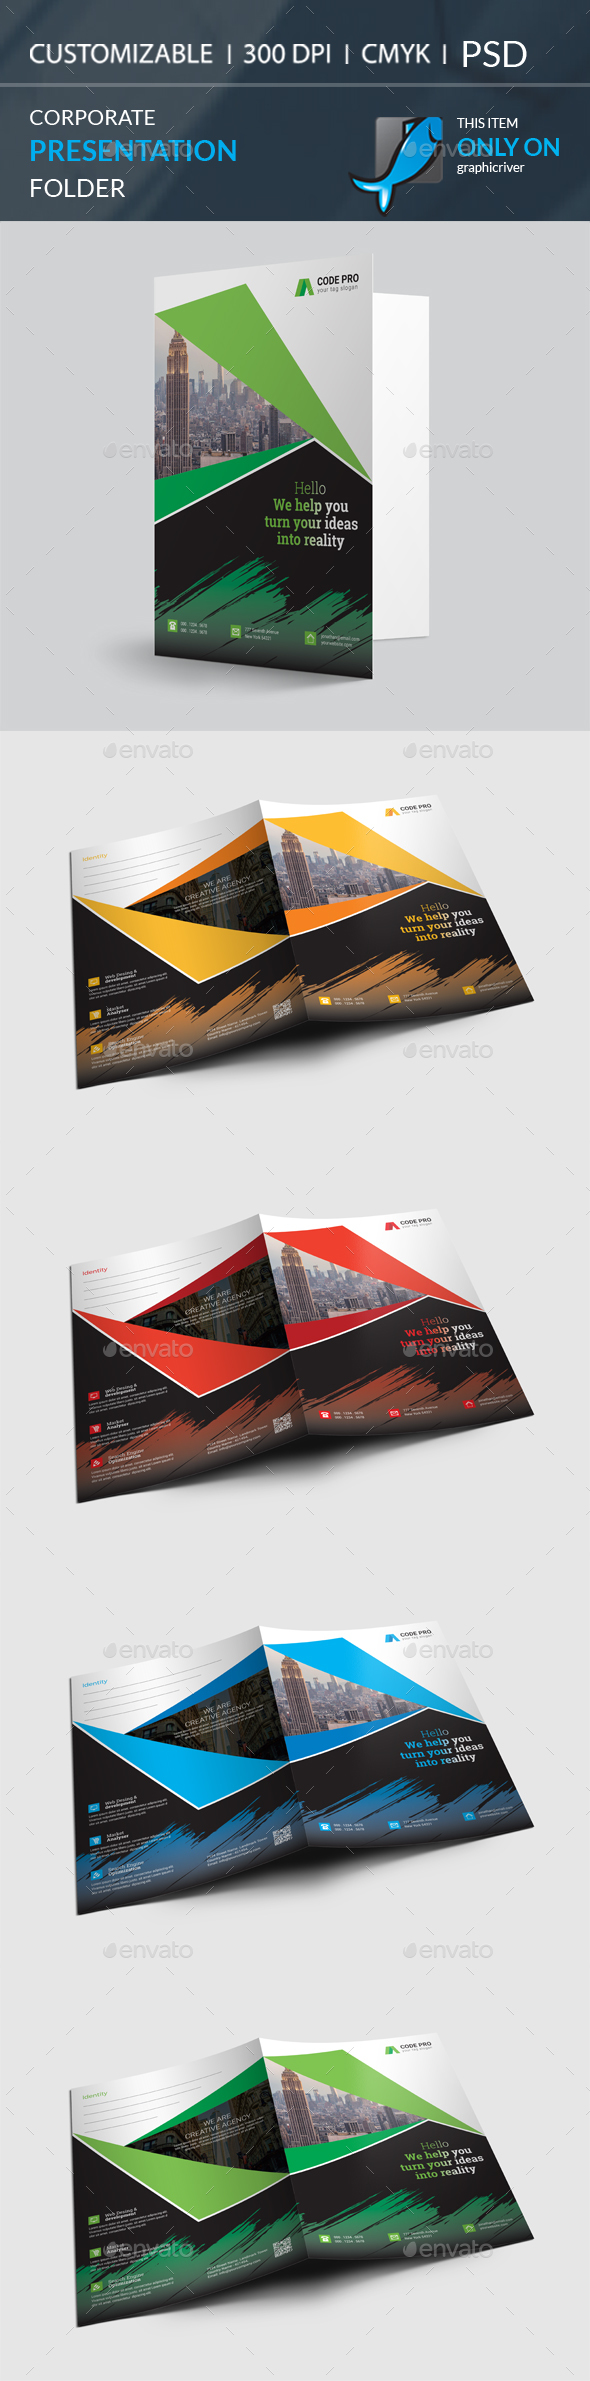 GraphicRiver Presentation Folder 20891131